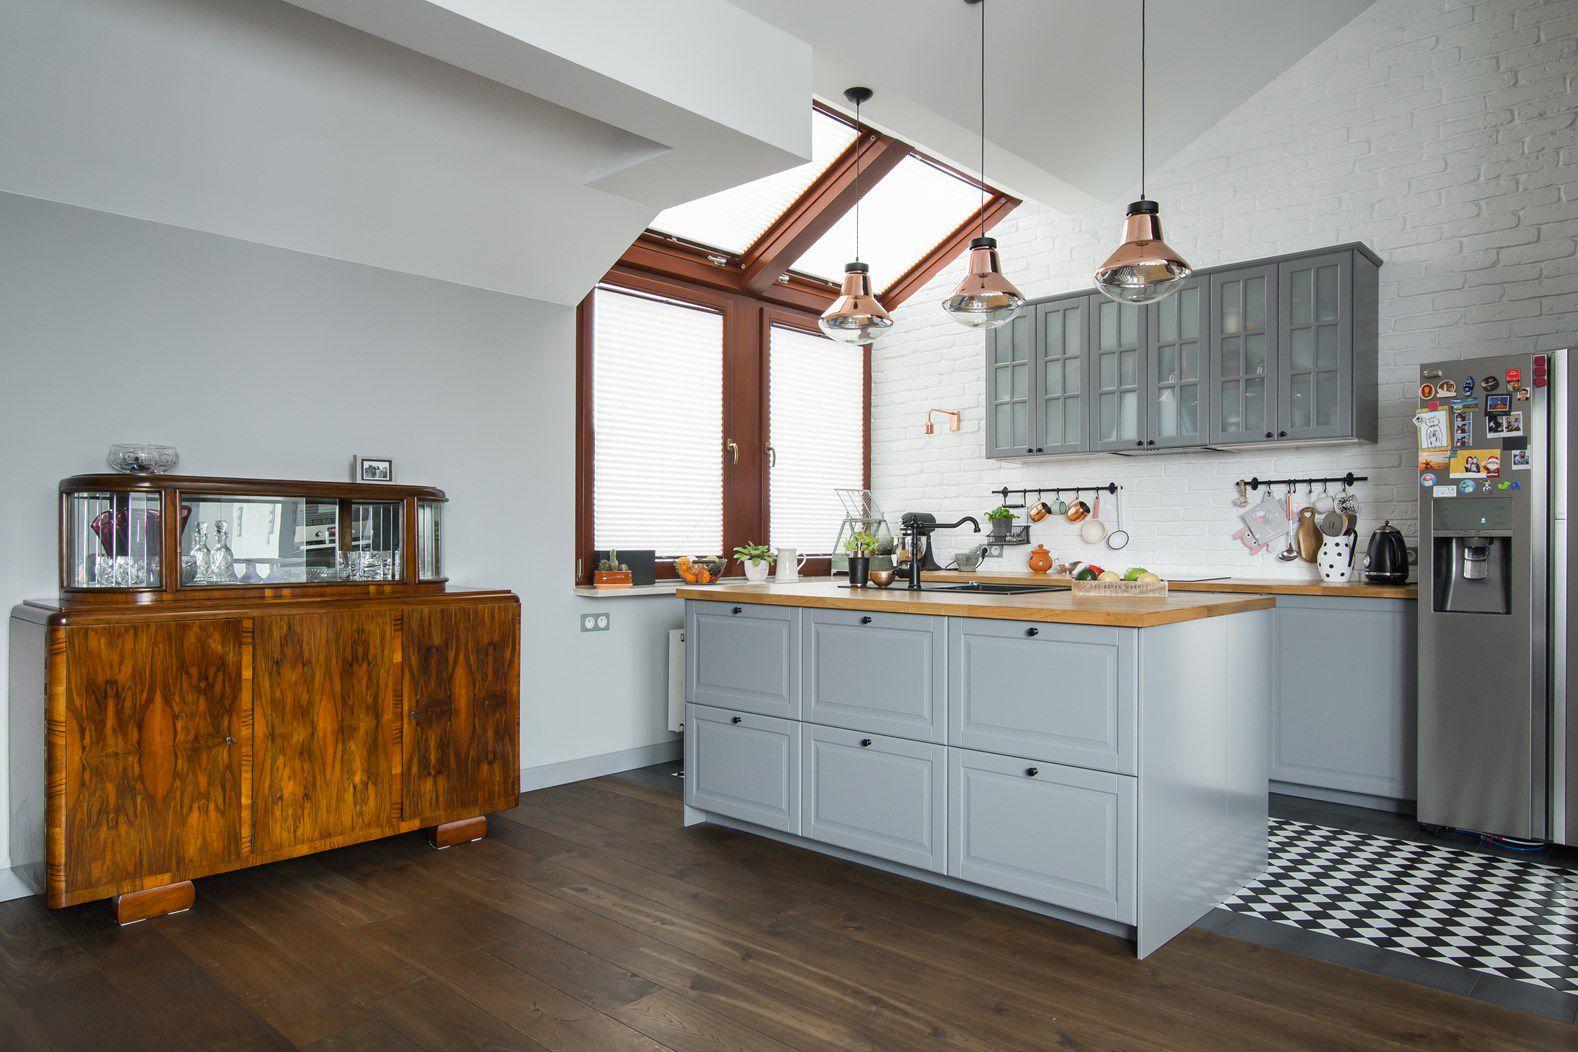 Zdjecie Kuchnia Z Wyspa Na Poddaszu Kitchen Inspirations Rustic Kitchen Boho Kitchen